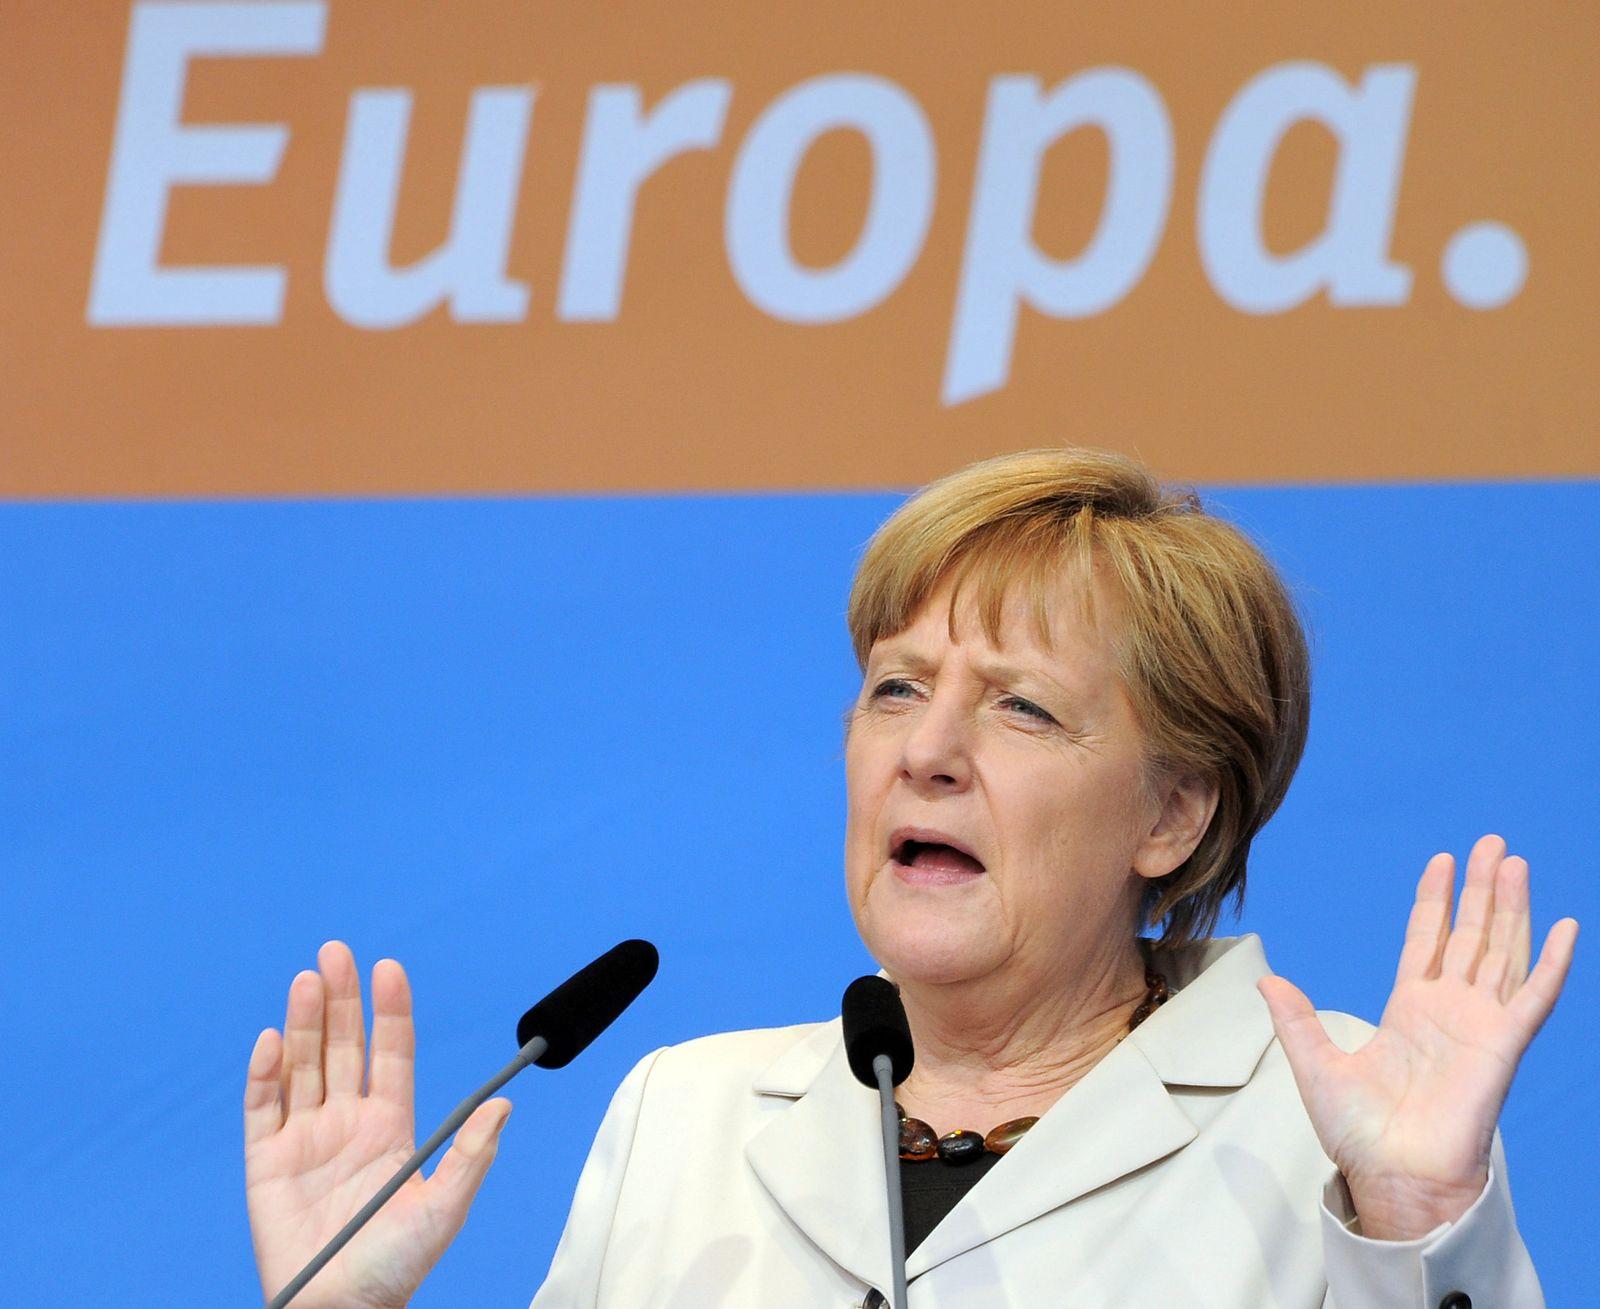 Wahlkampfveranstaltung mit Merkel